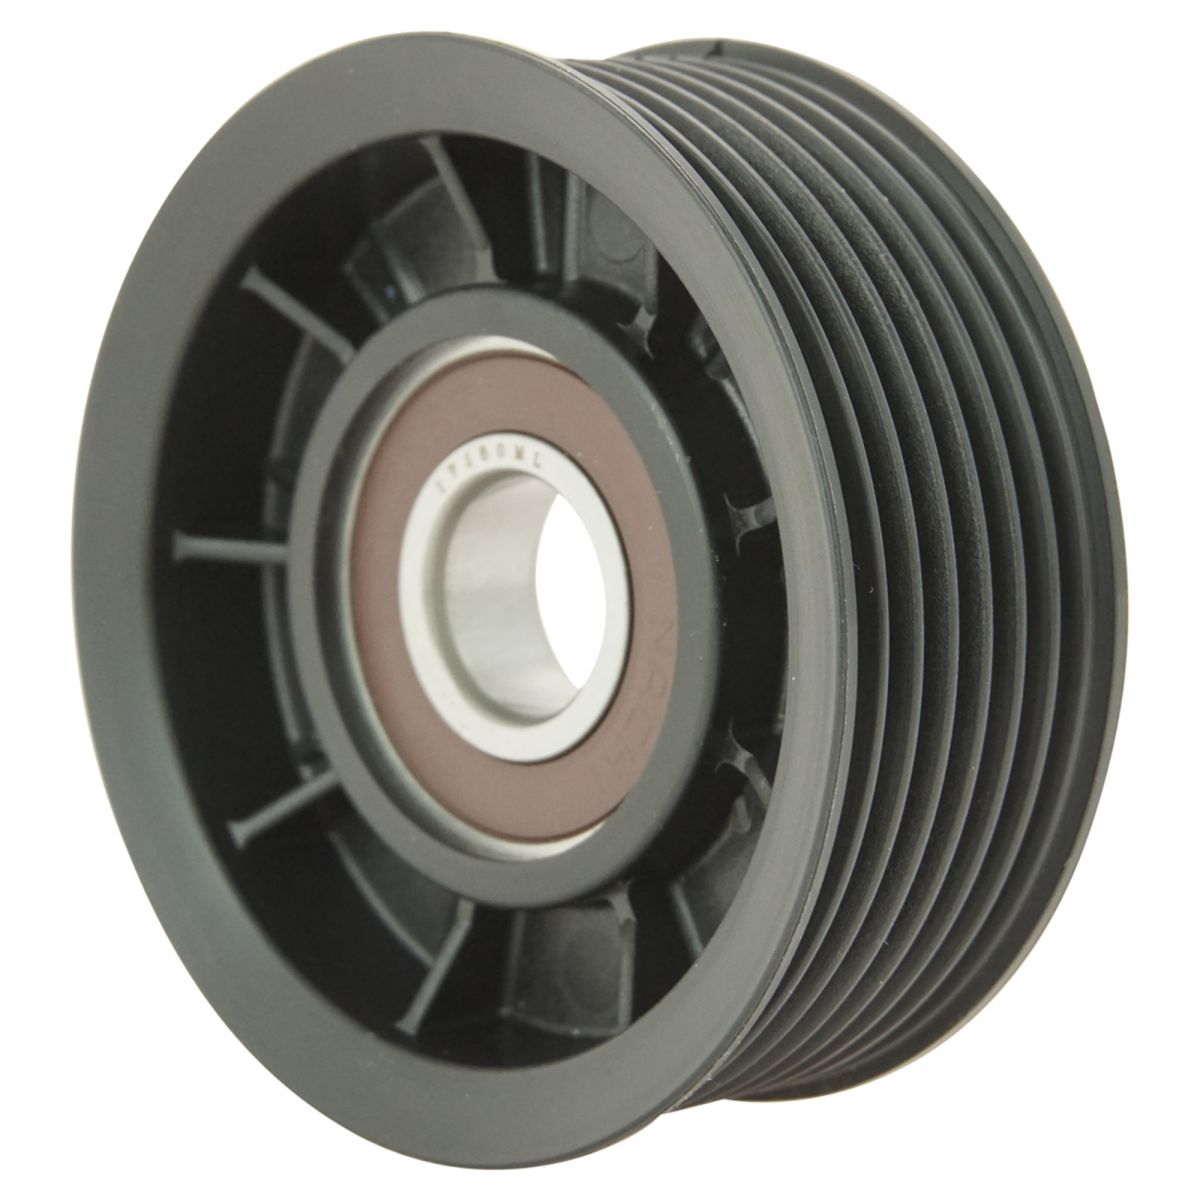 hight resolution of hemi serpentine belt idler pulley grooved for 03 08 dodge ram pickup truck 5 7l